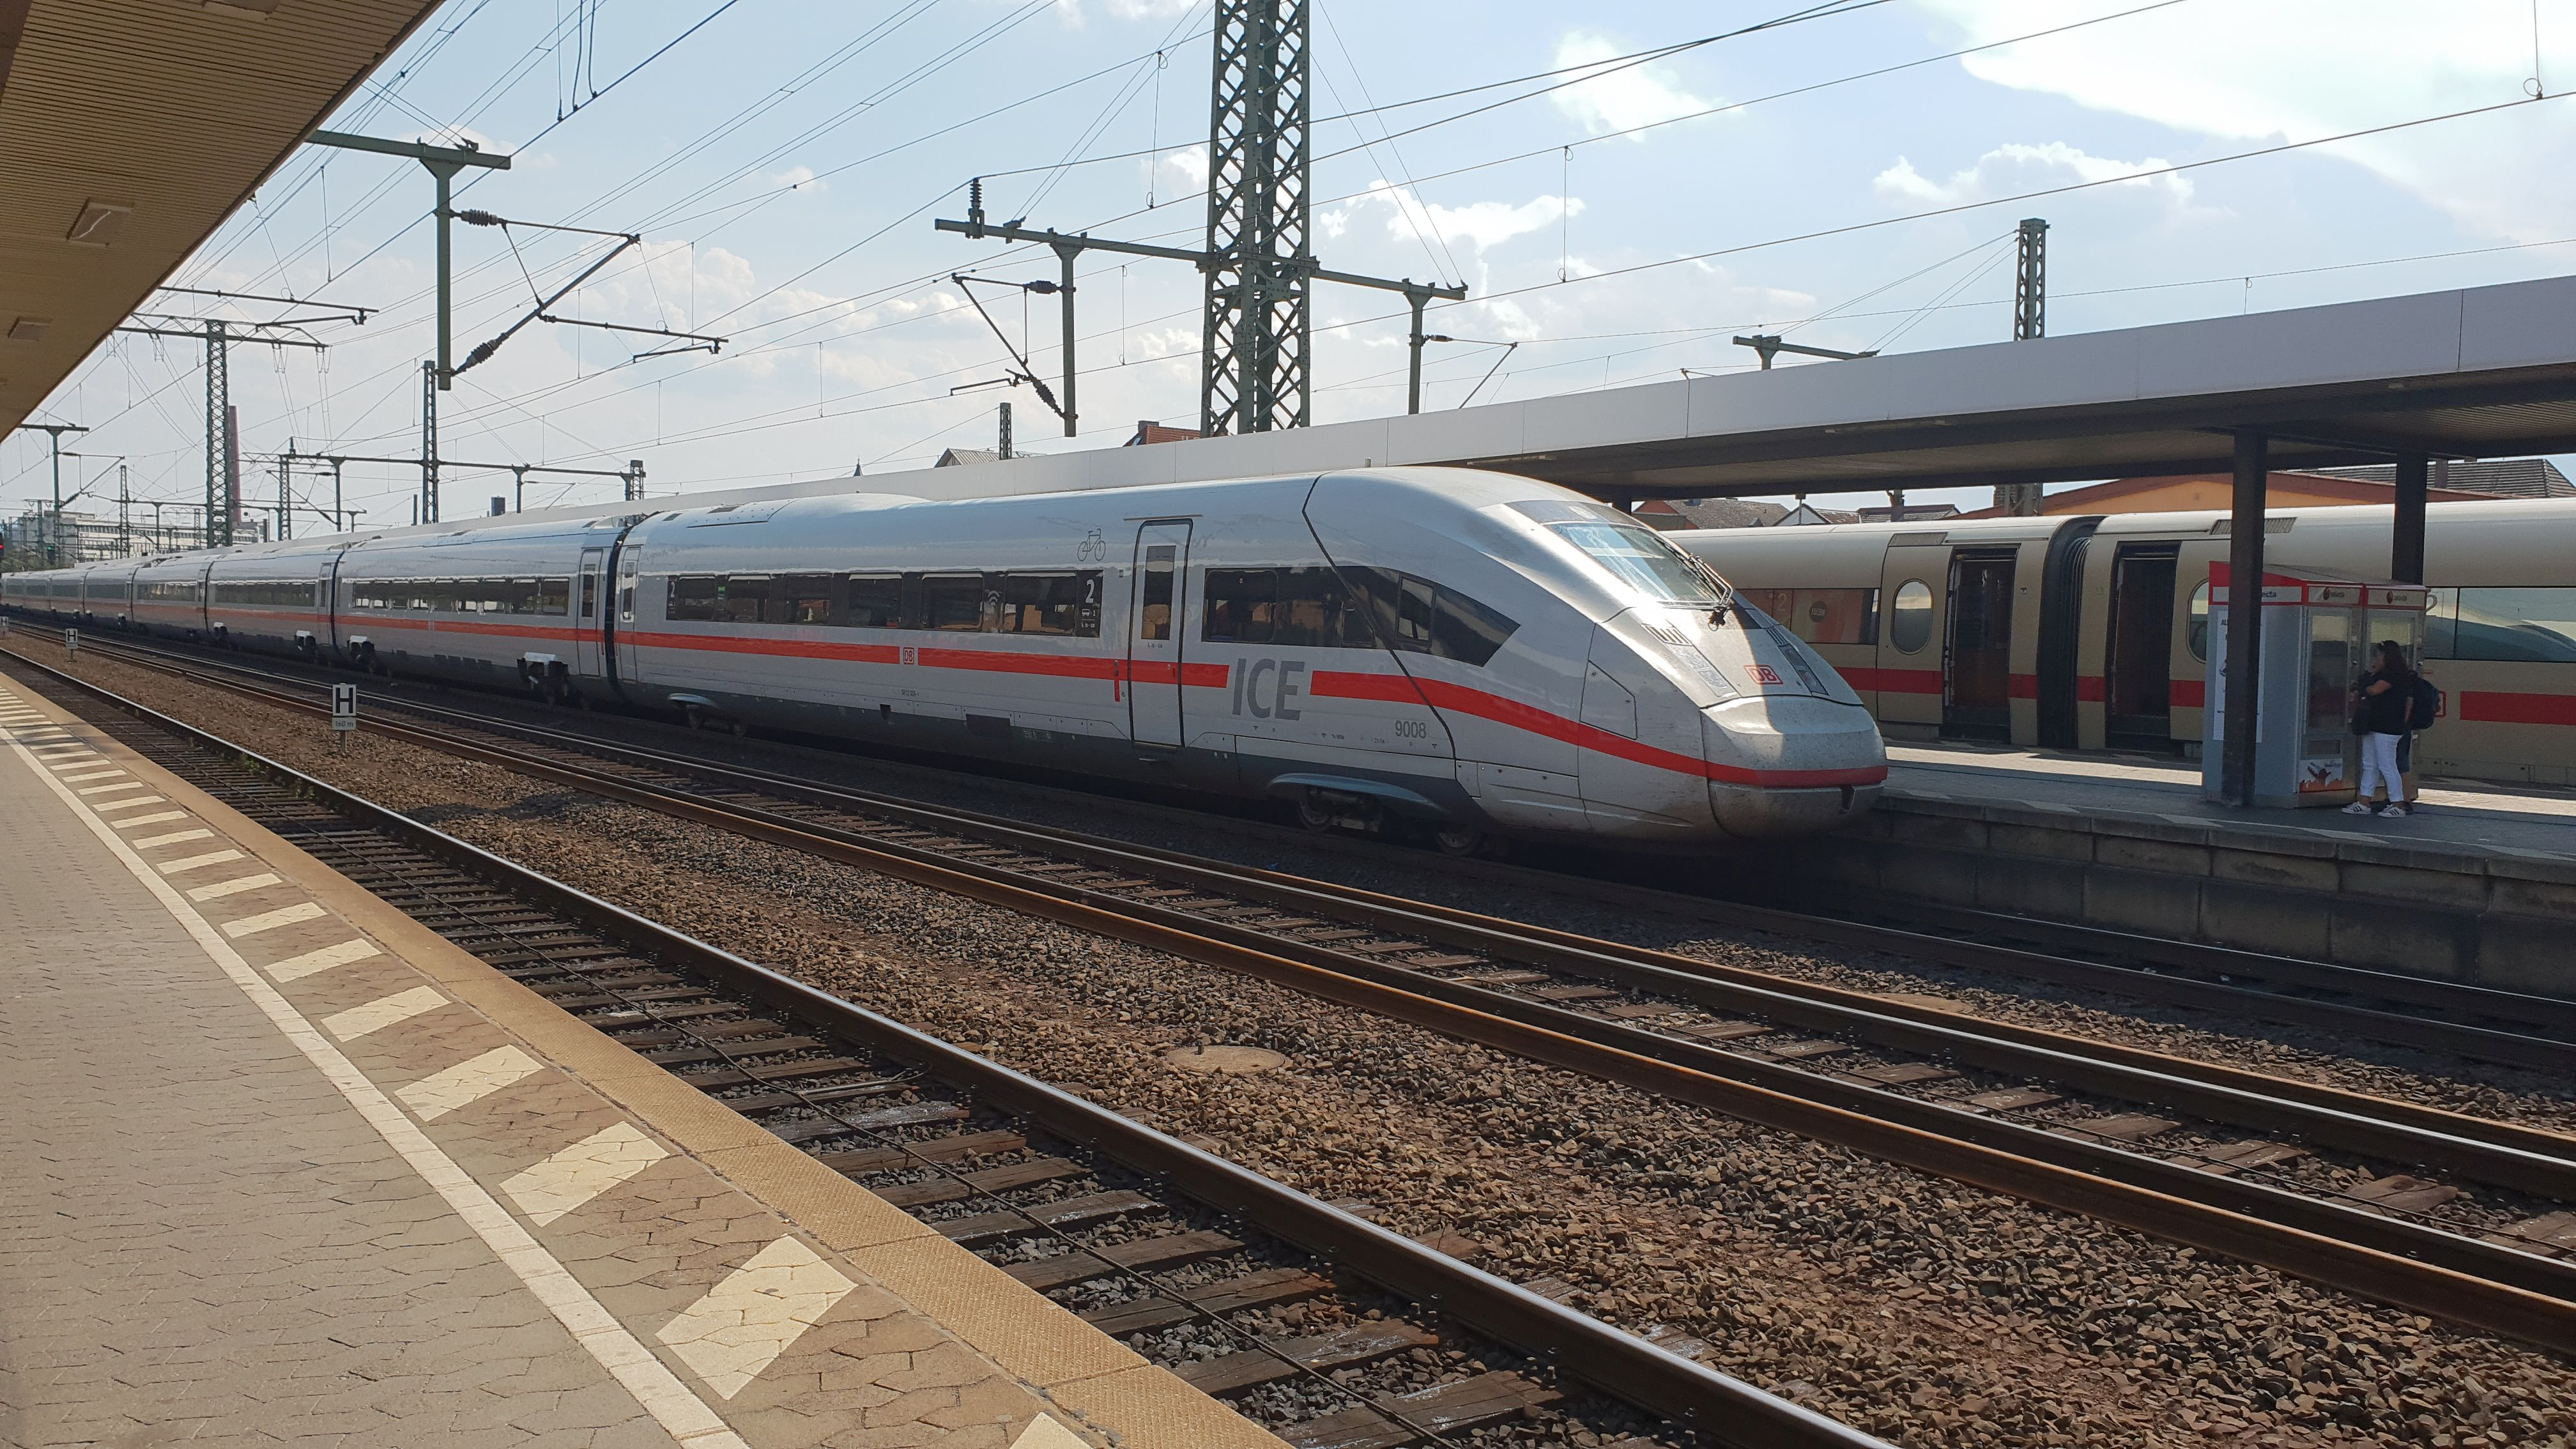 Foto: ICE4 BR 412 Zug 9008 in Fulda, 2018